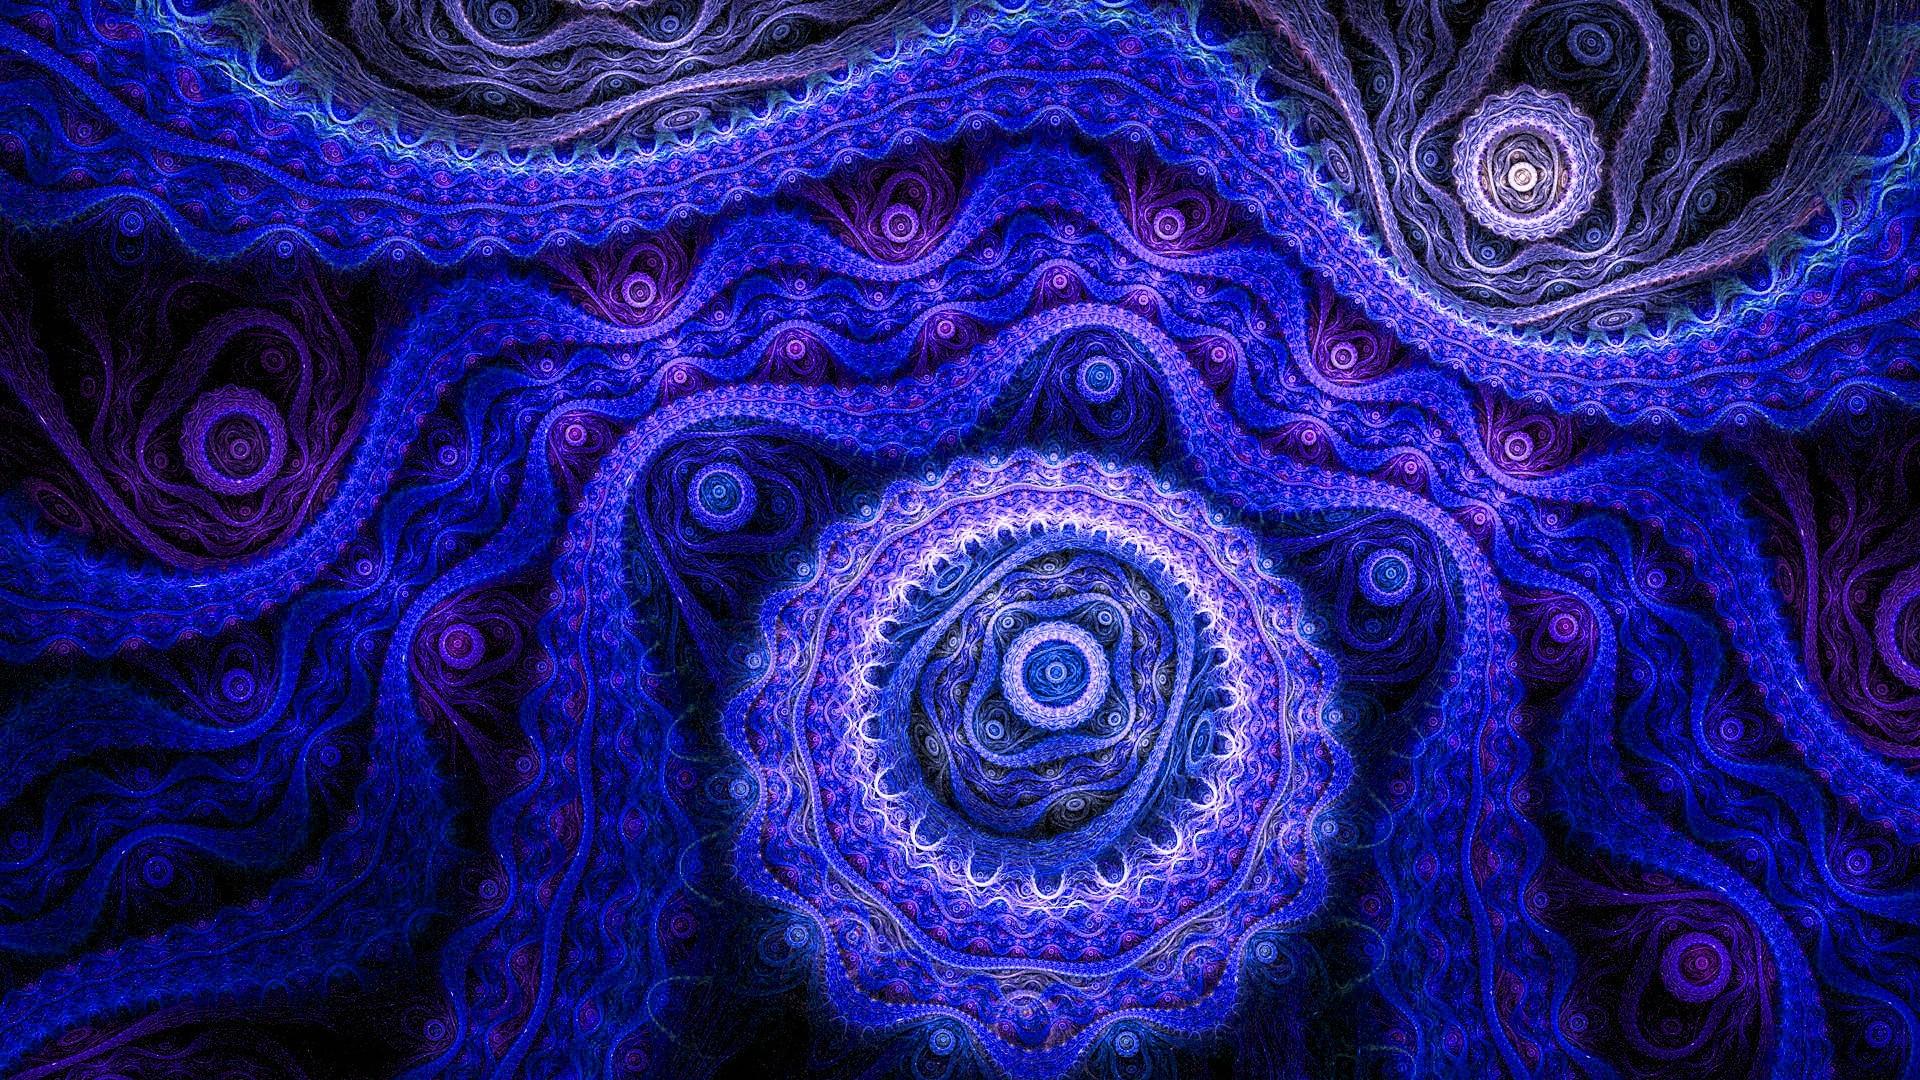 Wallpaper abstract, blue, pattern, purple, dark